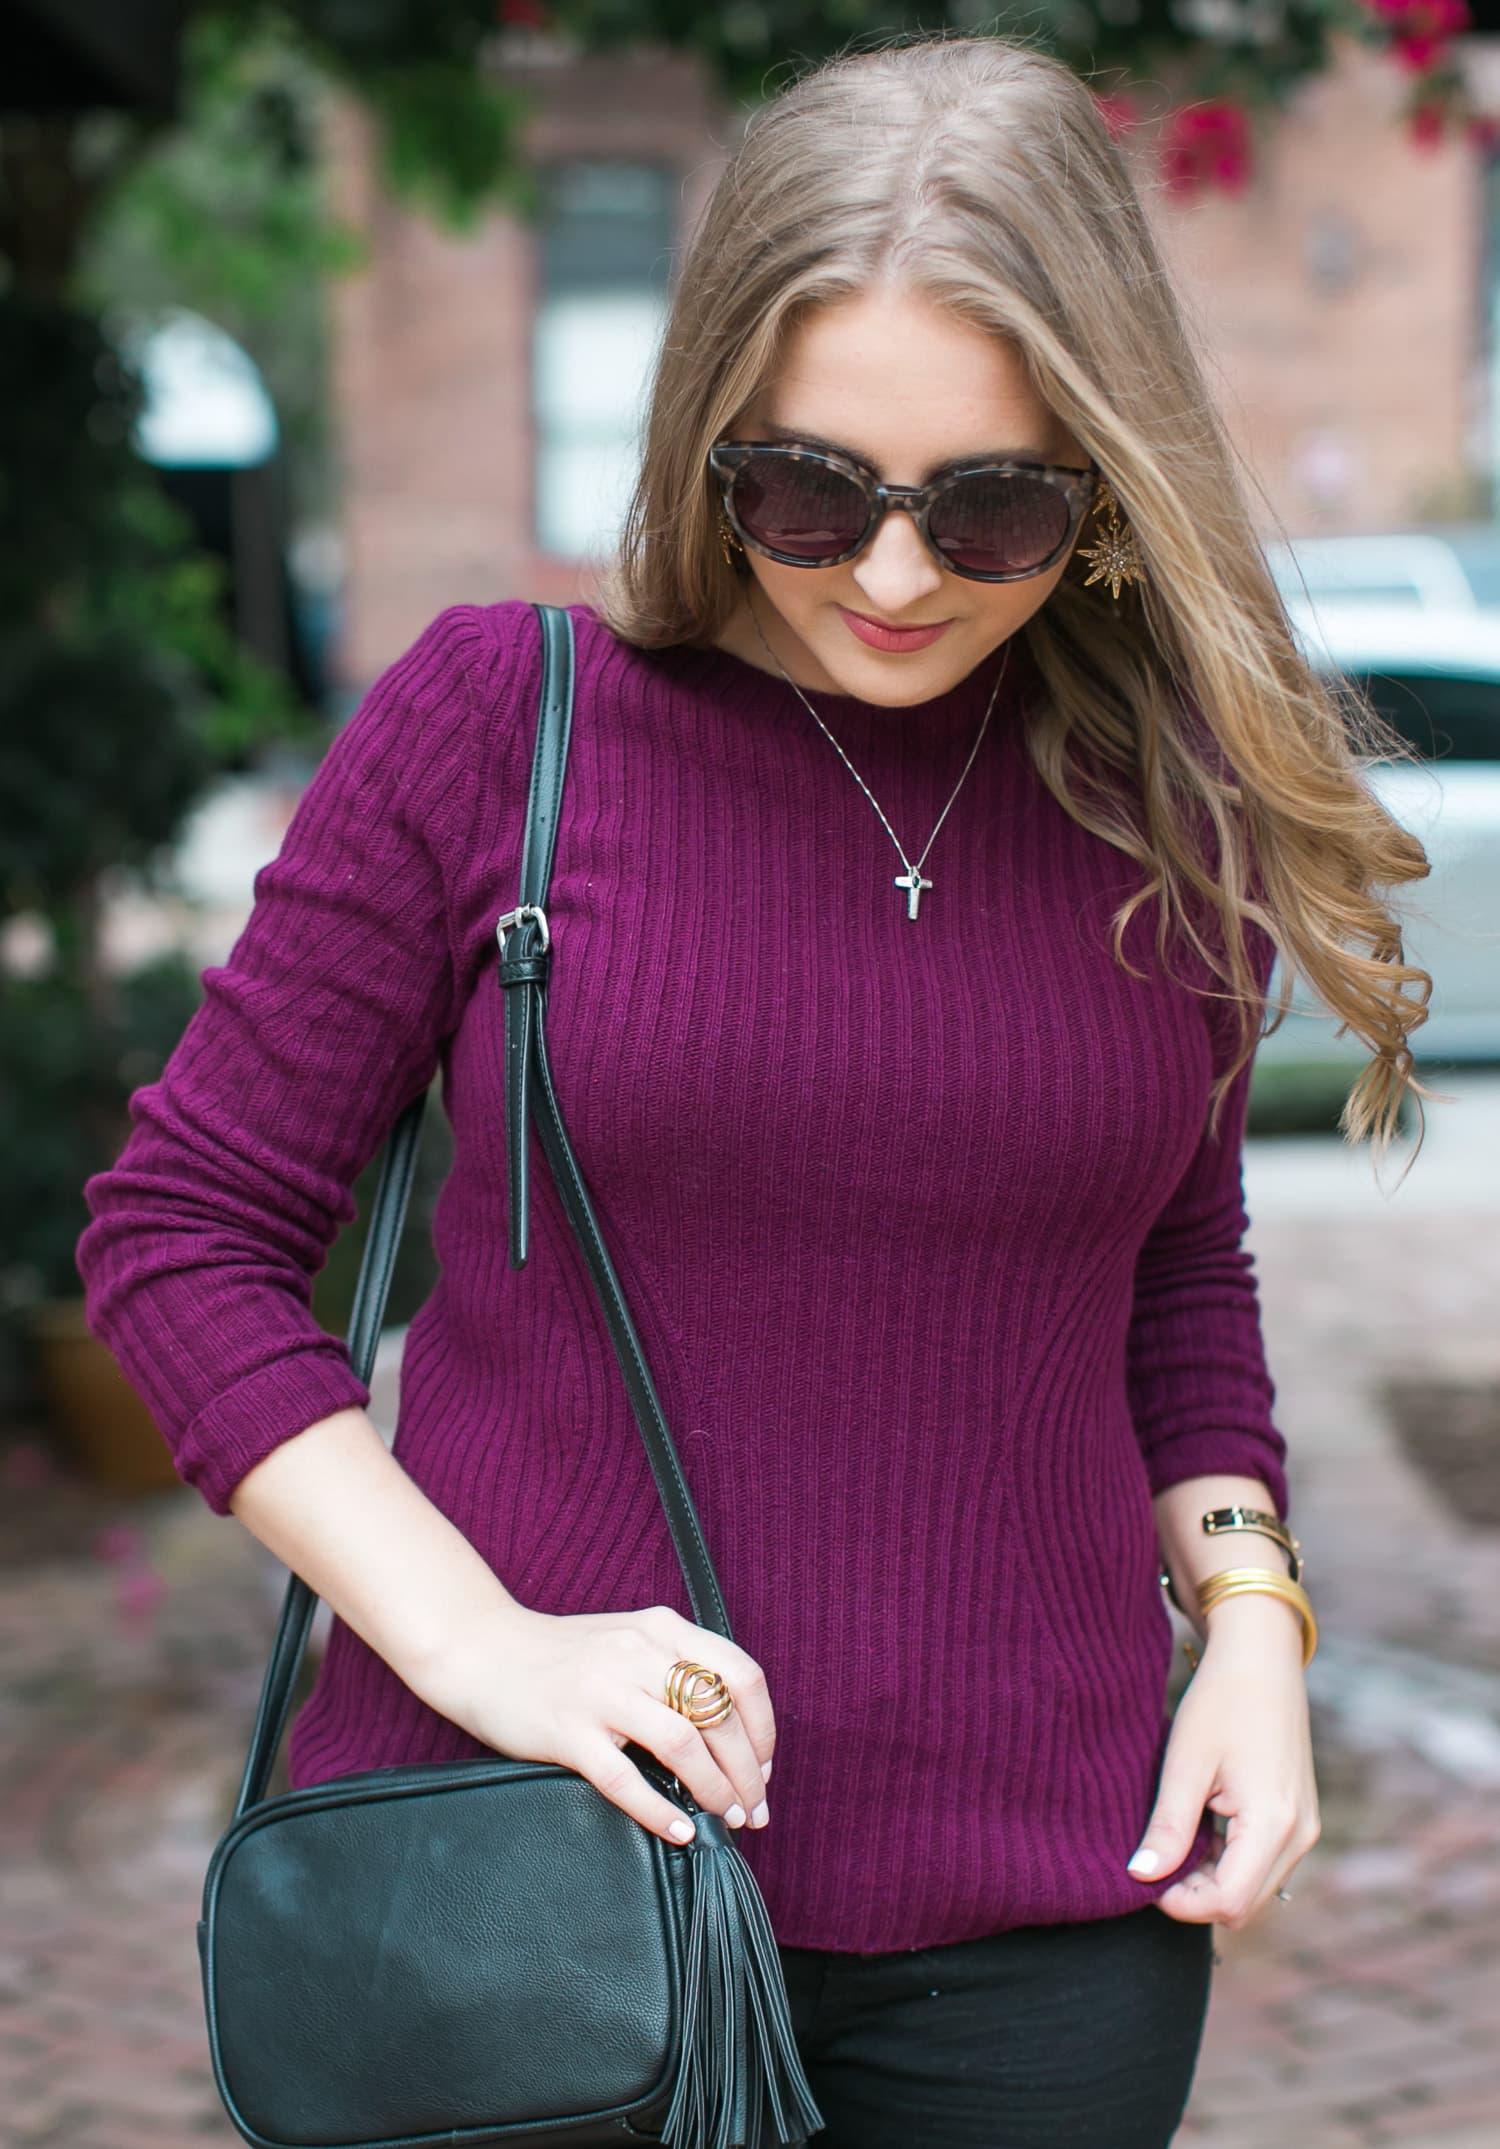 black-ripped-jeans-retro-round-sunglasses-burgundy-cashmere-sweater-black-pointy-toe-pumps-tassel-handbag-035